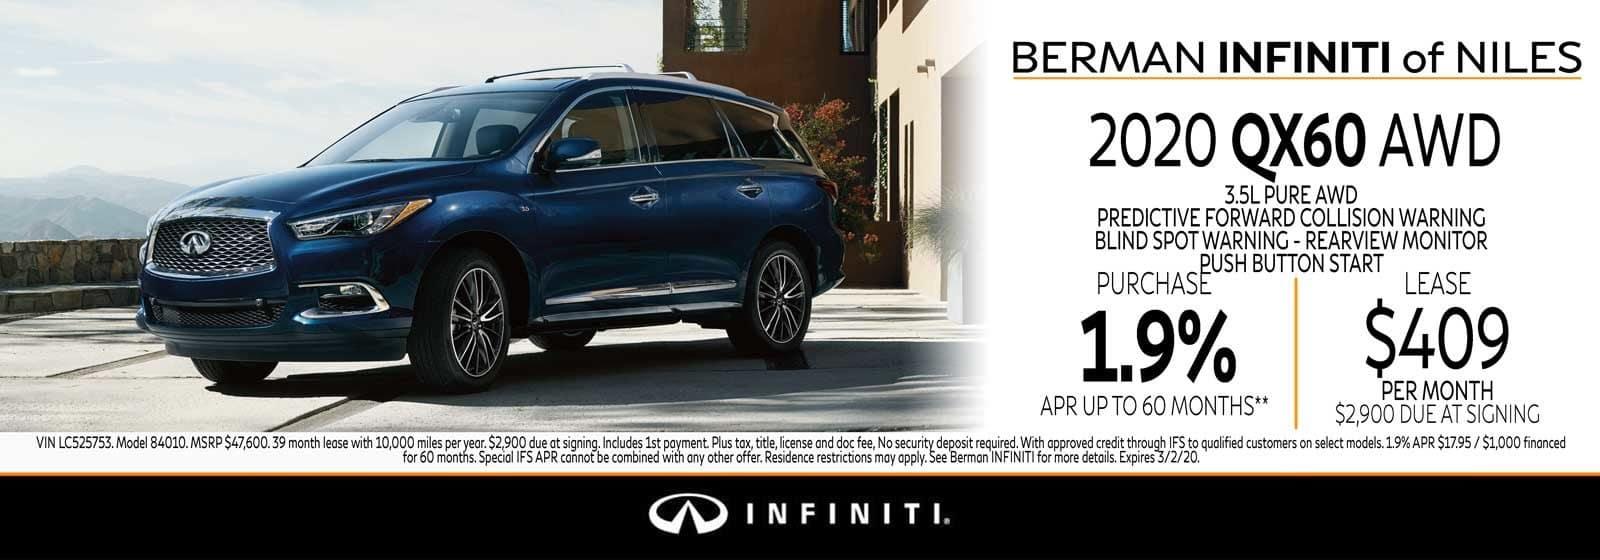 New 2020 INFINITI QX60 February Offer at Berman INFINITI of Niles!